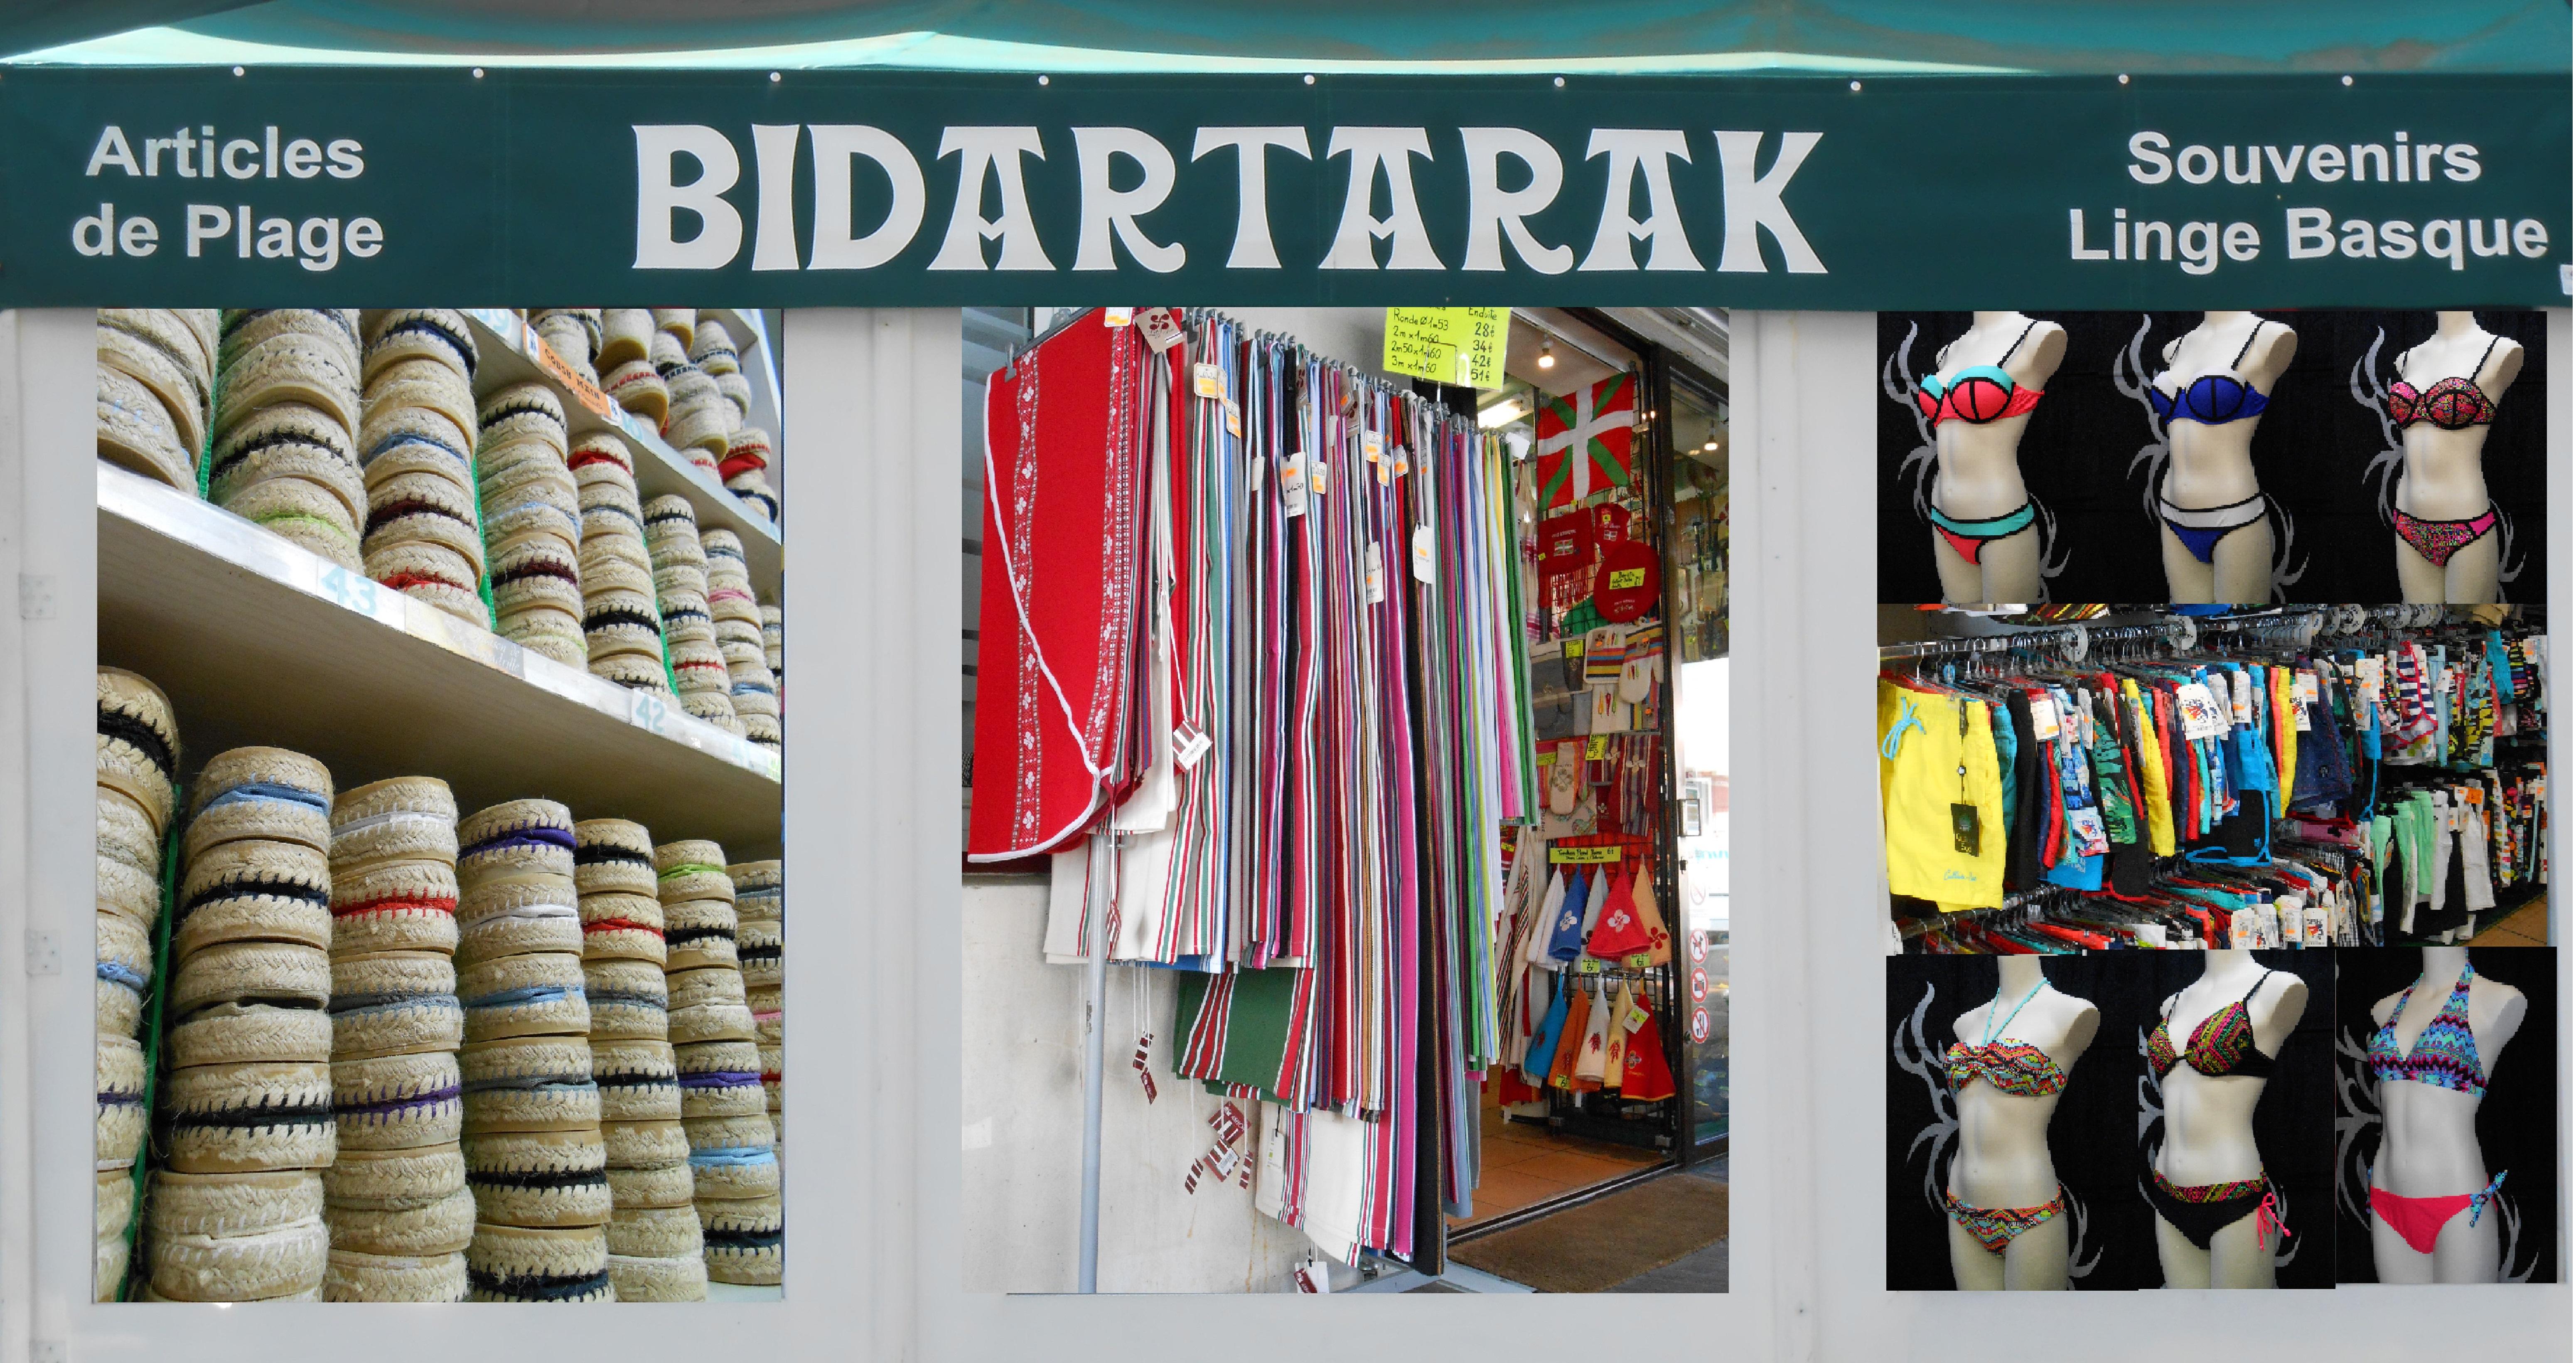 Bidart64Commerces À Bidart64Commerces À Bidartarrak Bidartarrak À Bidartarrak À Bidartarrak Bidart64Commerces Bidart64Commerces 9IeWHY2DE